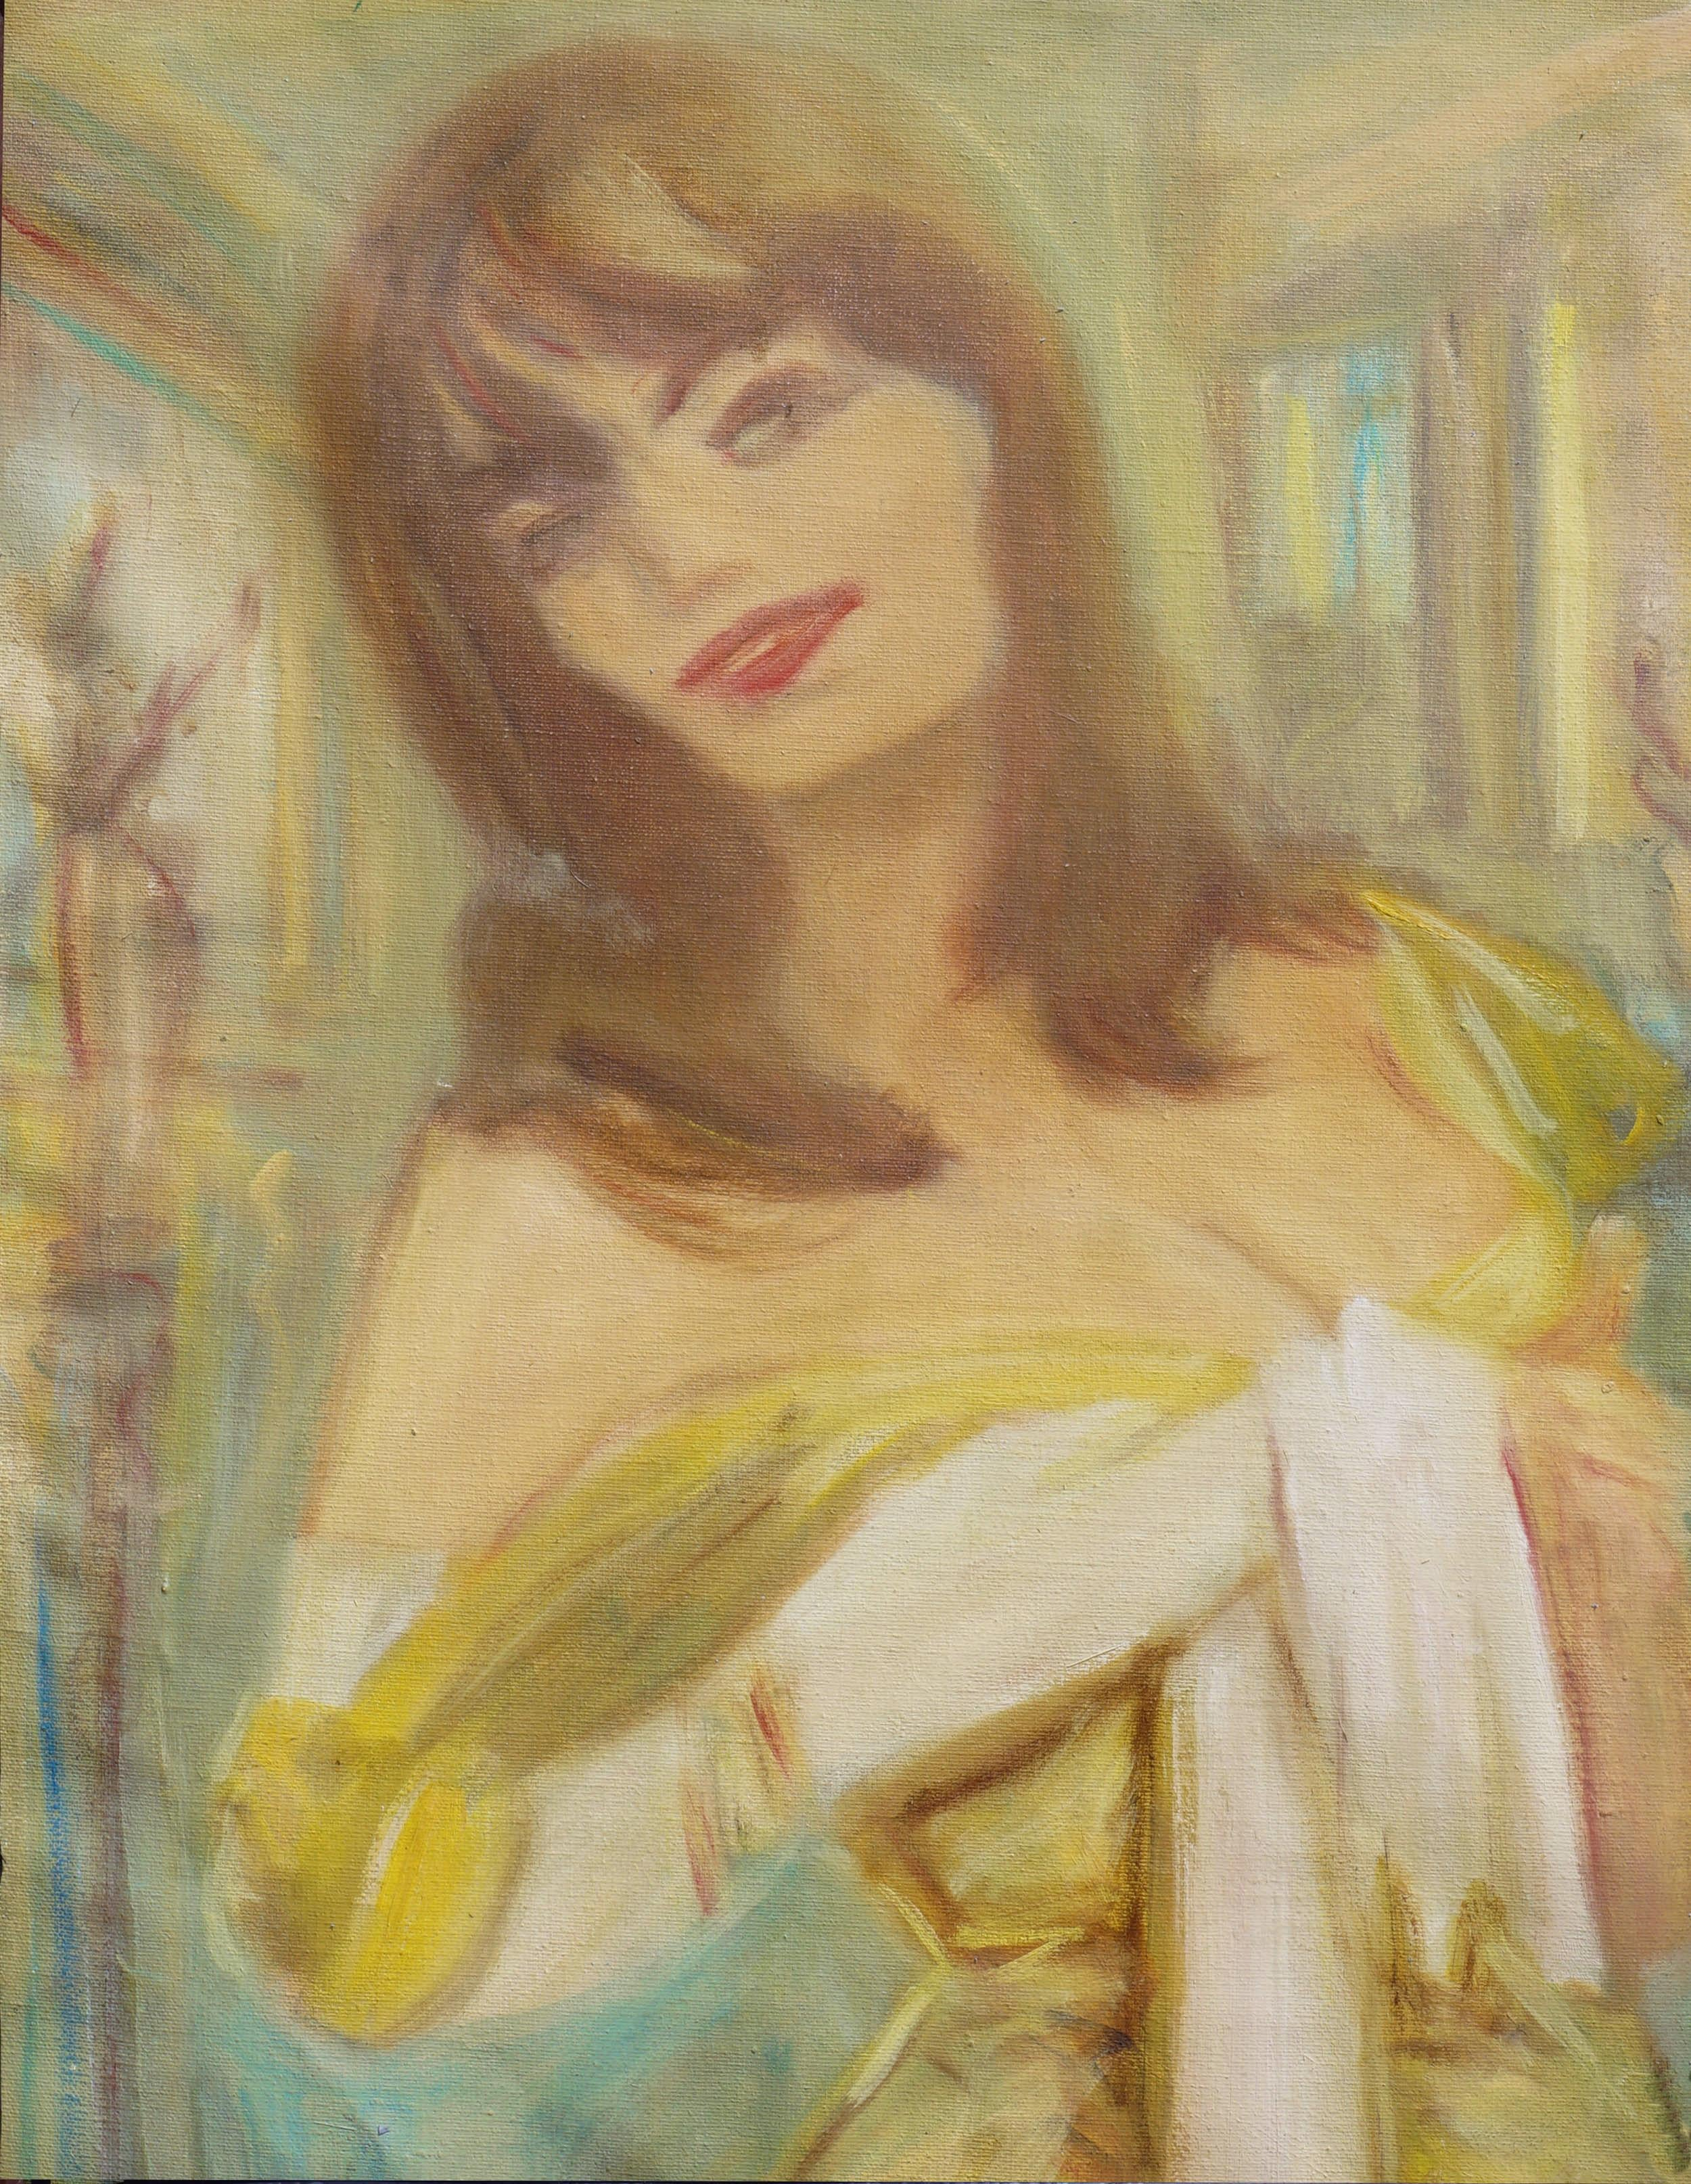 Woman in Yellow Evening Dress, Mid Century Modern Pulp Art Figurative Portrait